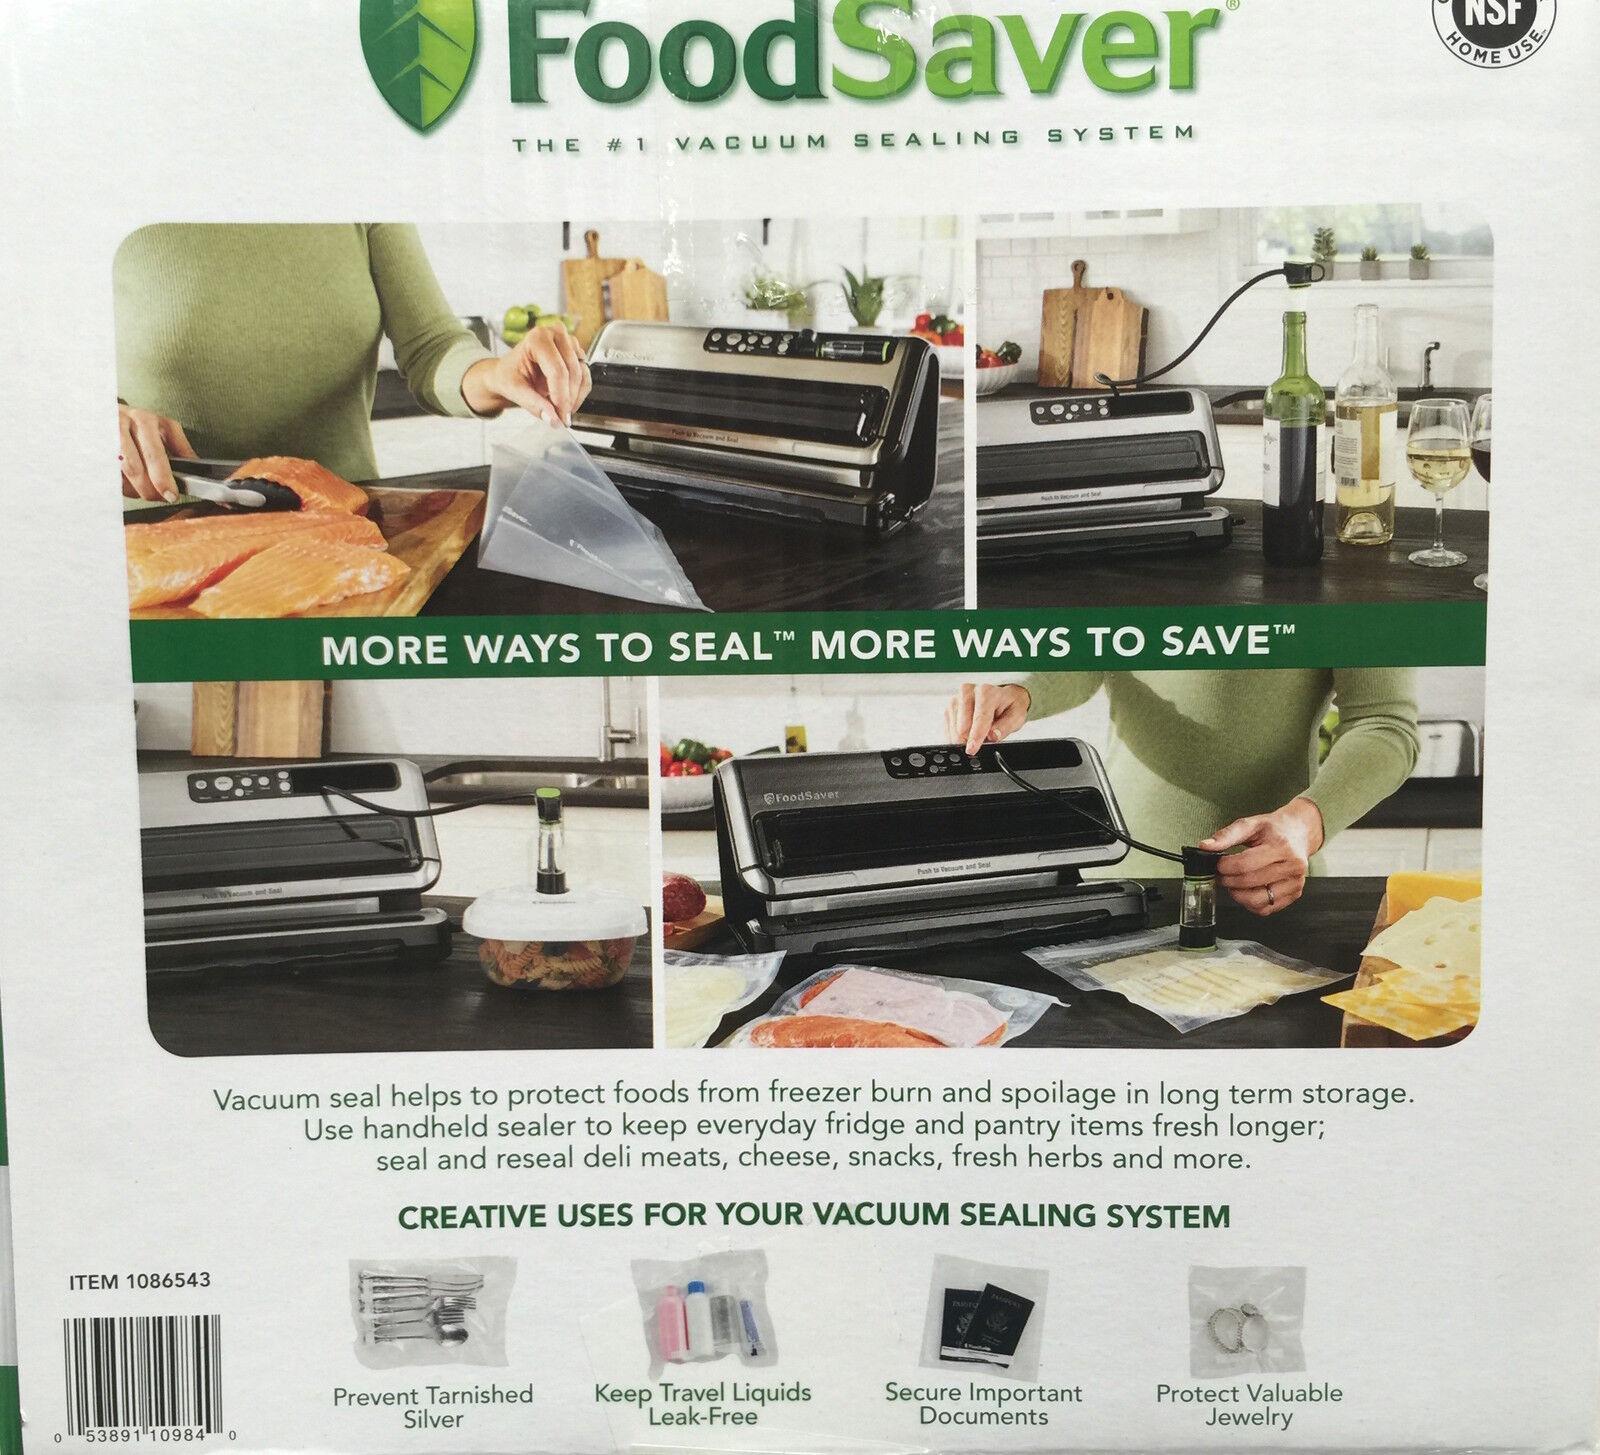 New Foodsaver 5400 Series Vacuum Sealing System 5480